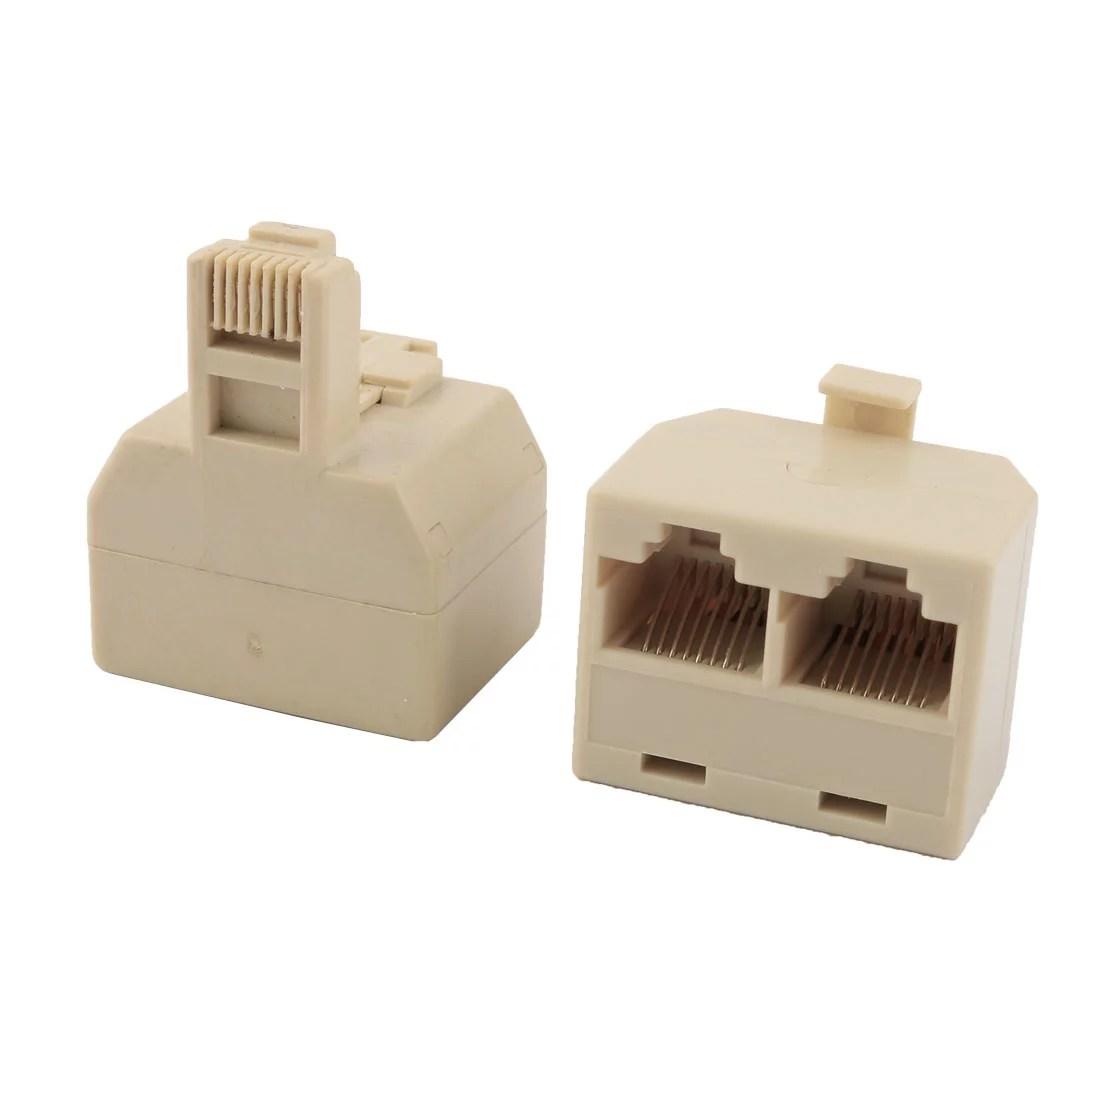 hight resolution of rj45 8p8c keystone 1 male to 2 female port network cable splitter beige 2pcs